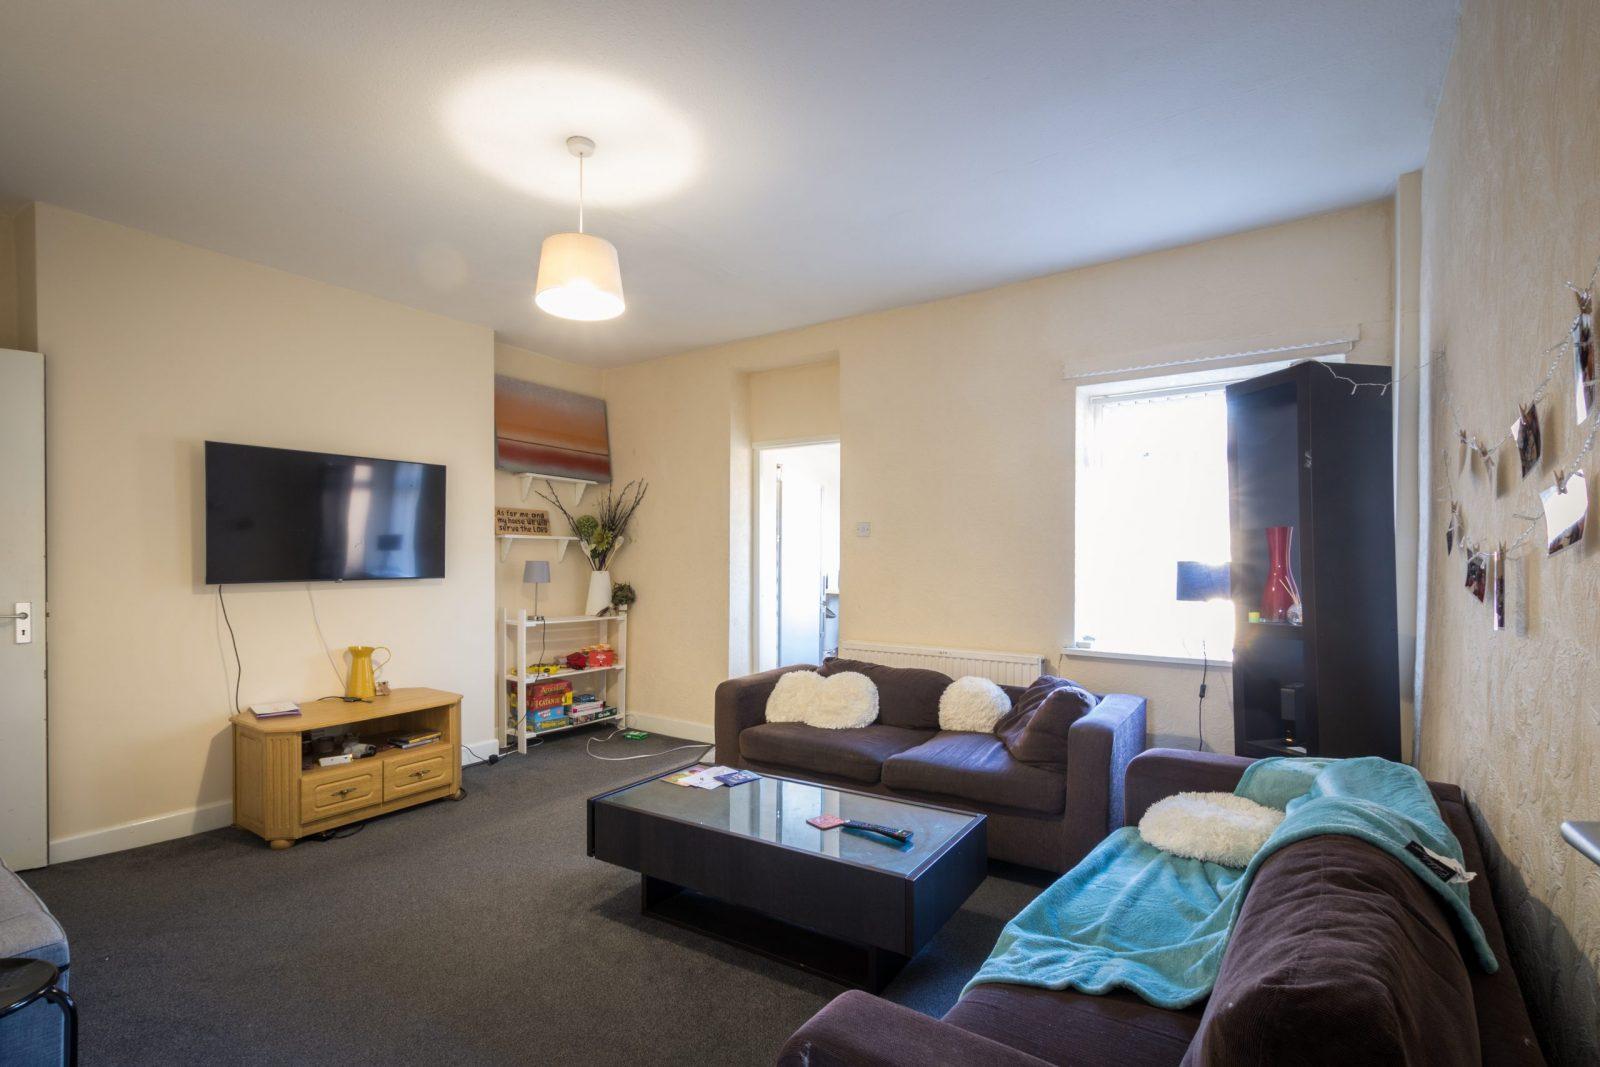 24 Prospect Street Lancaster Student House Accommodation